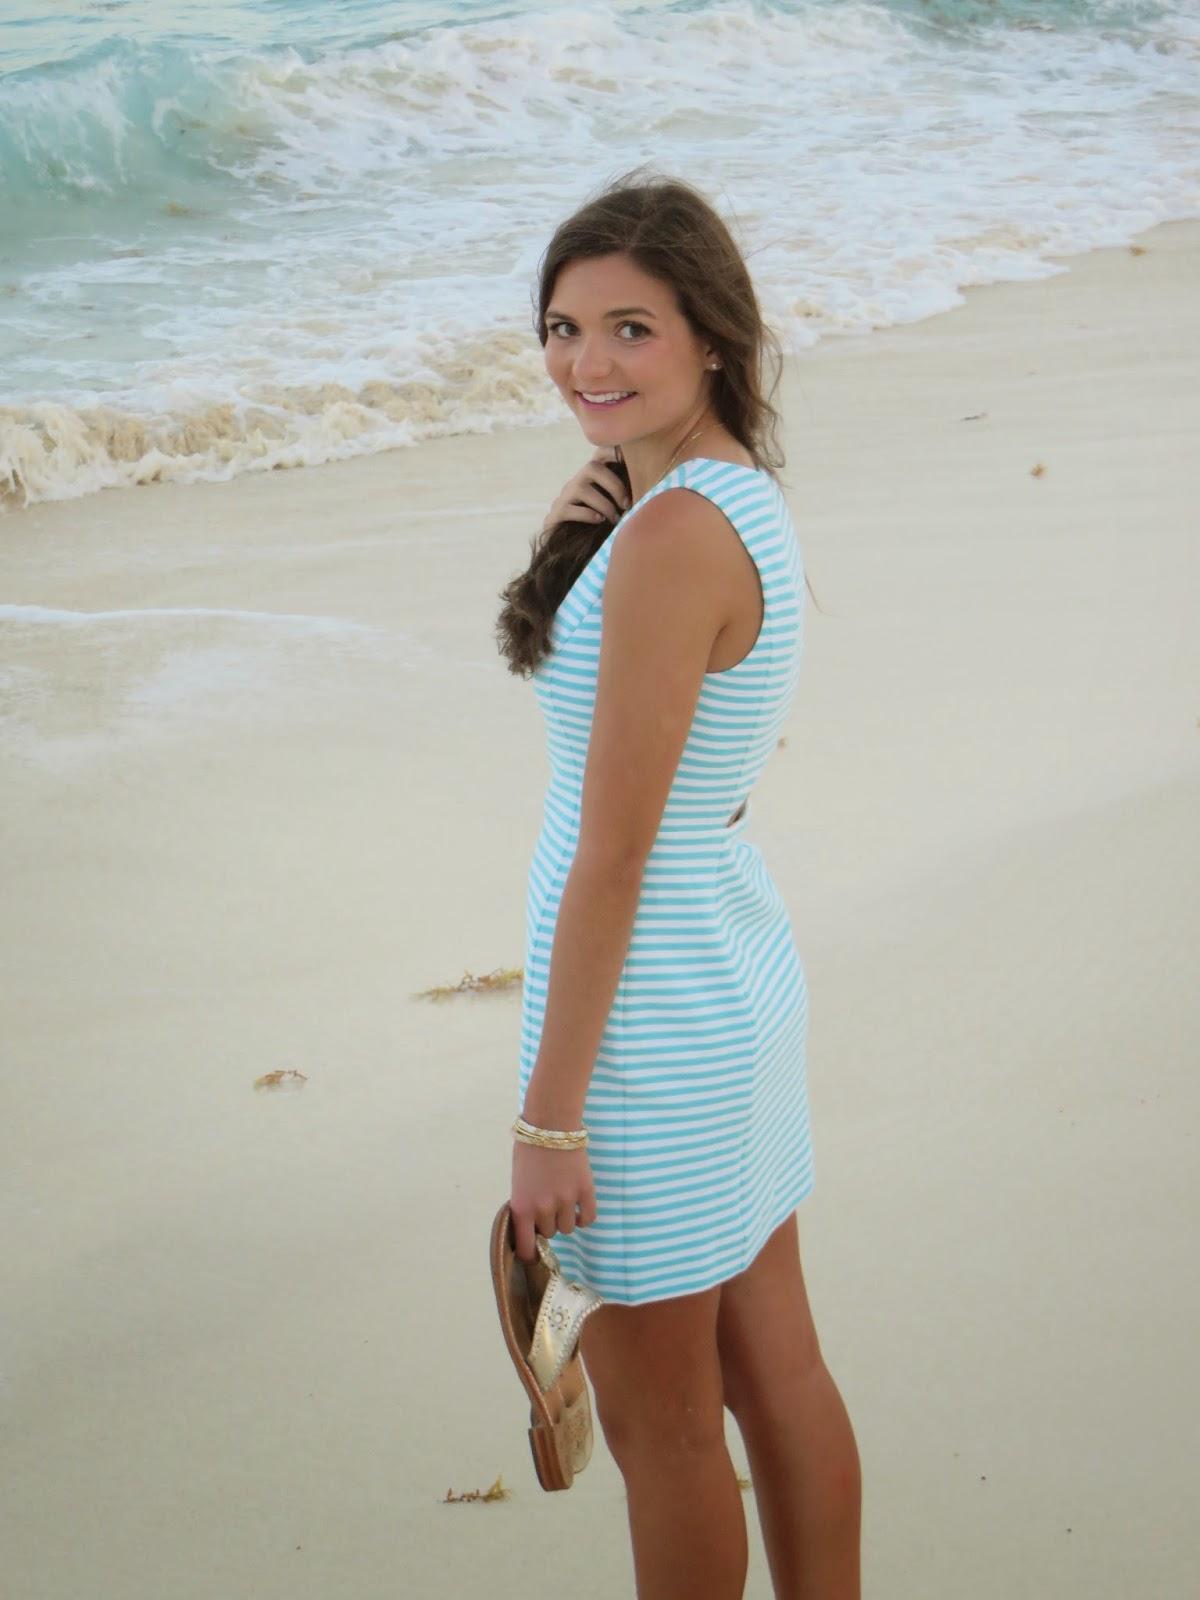 Lilly Pulitzer Whiting Cut-Out shift dress at Sandos Cancun